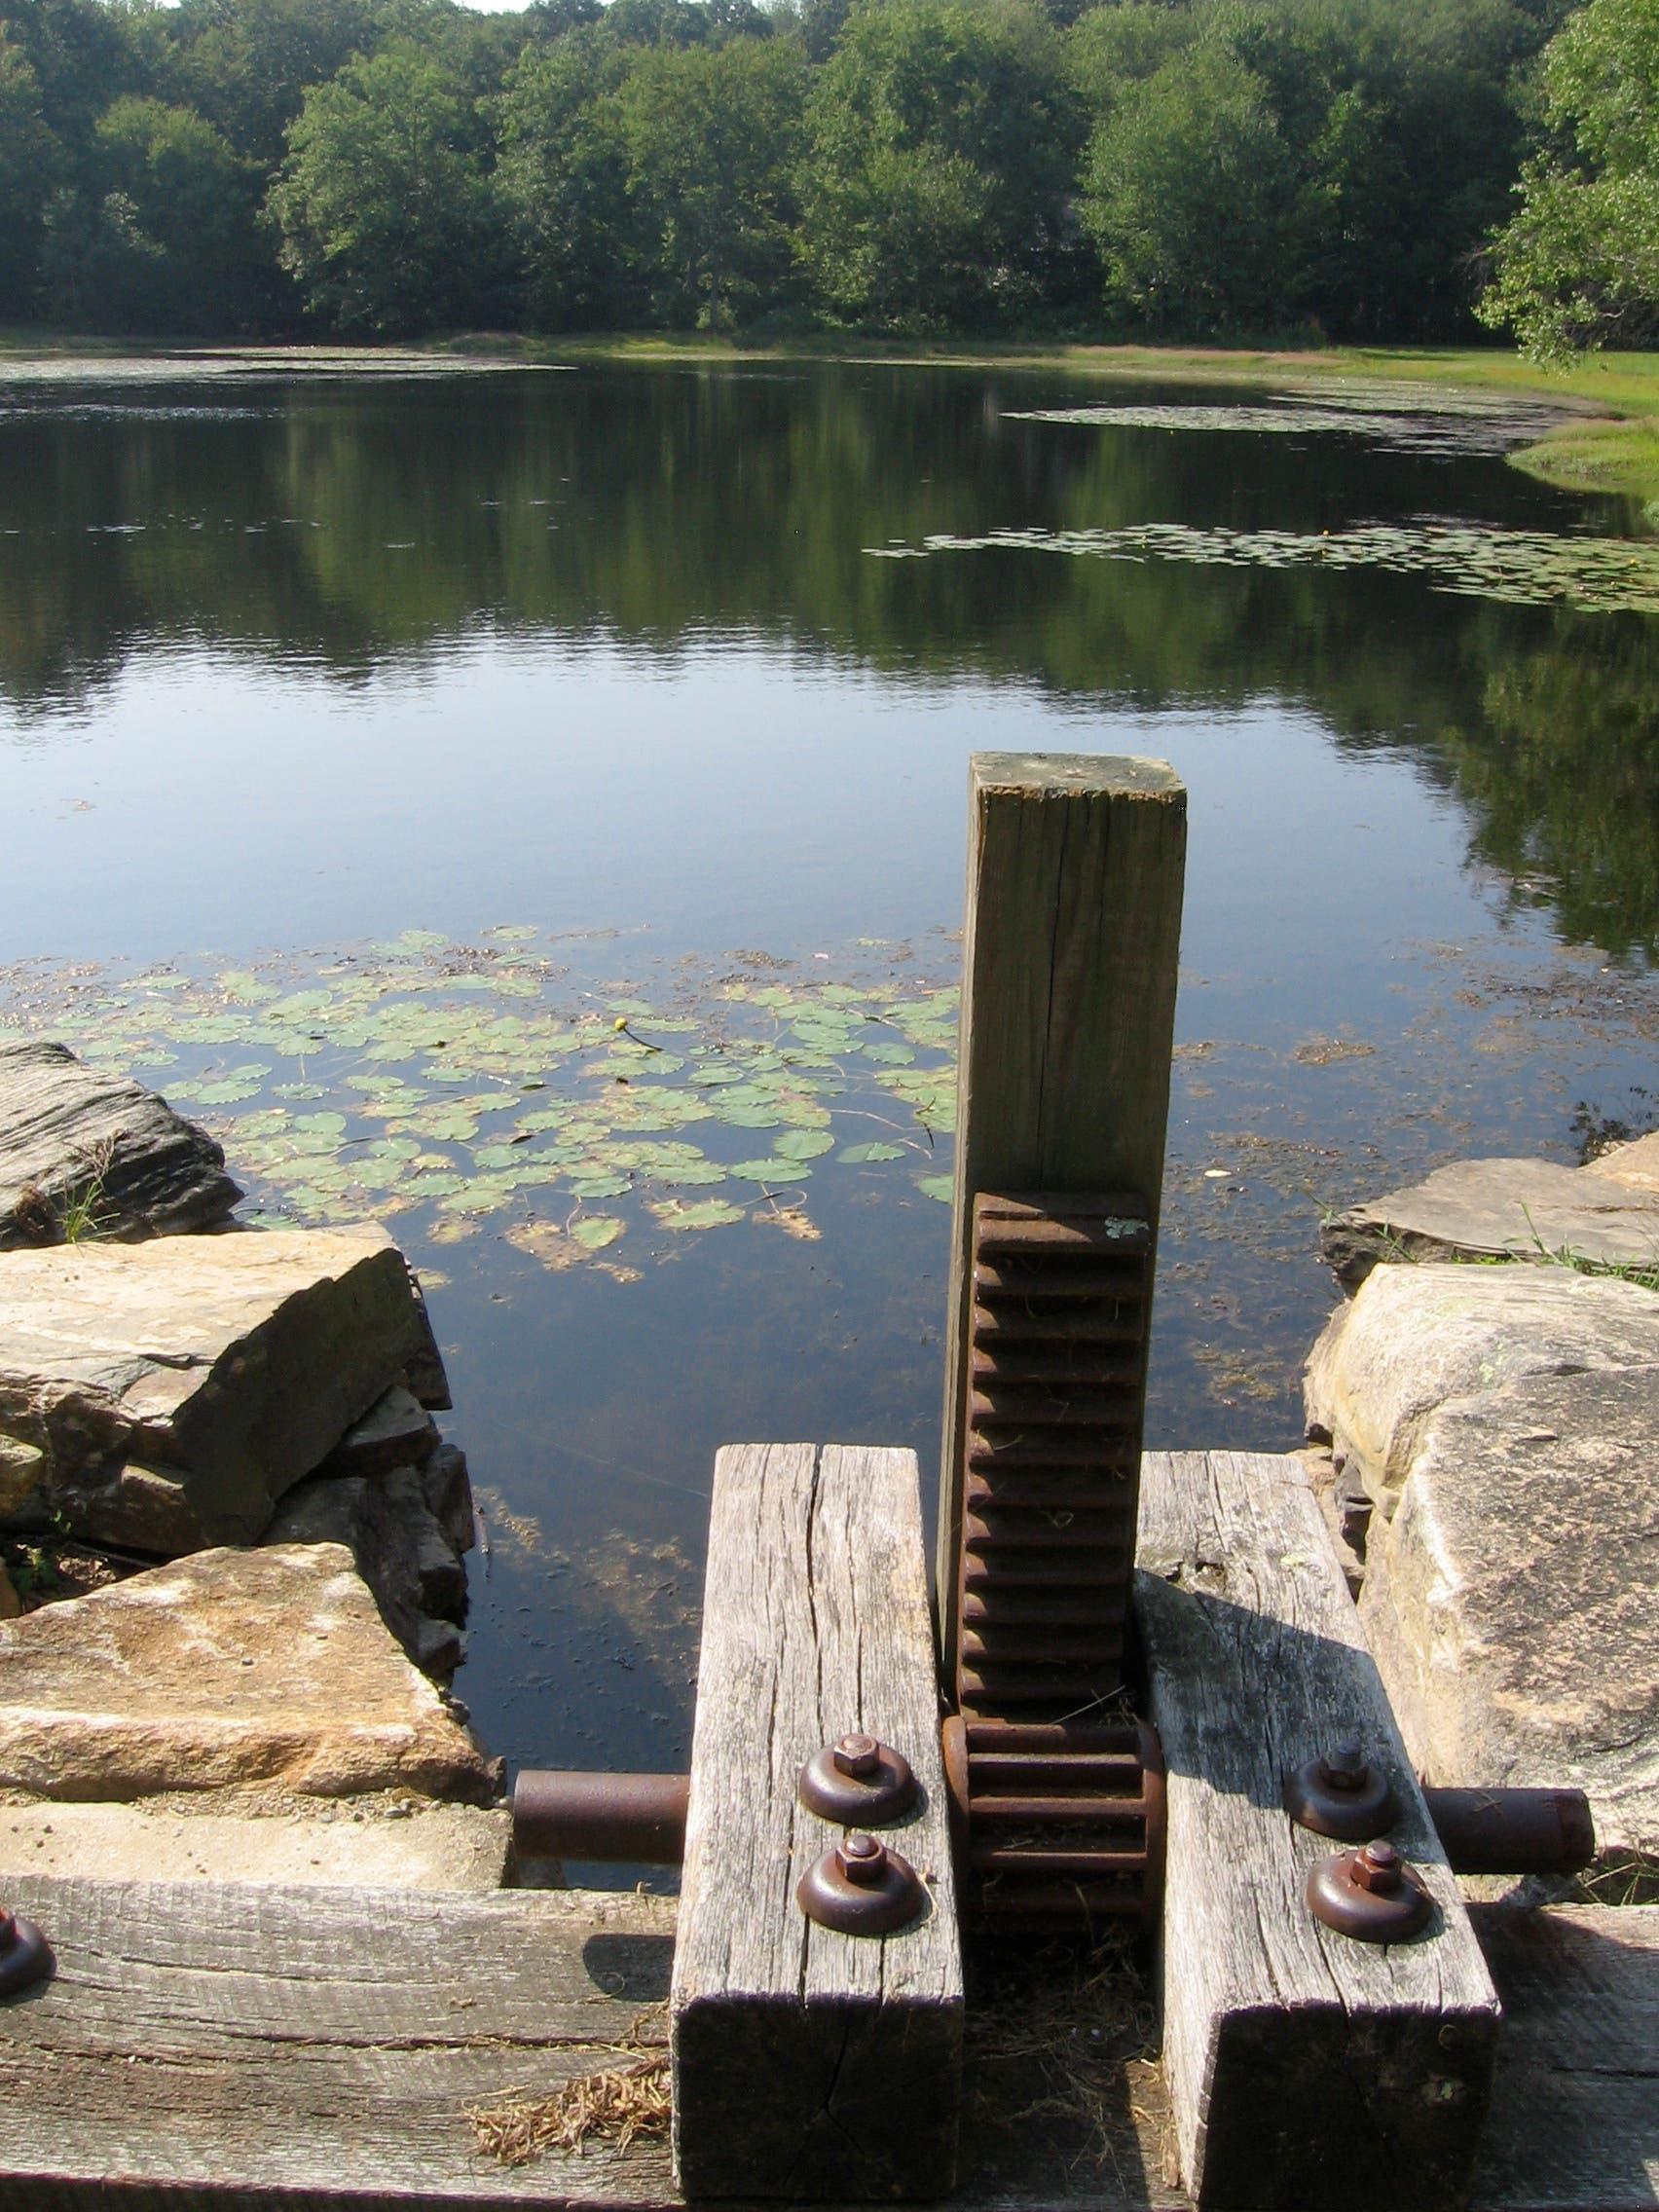 Historic Ledyard Up/Down Sawmill | Ledyard, CT Patch